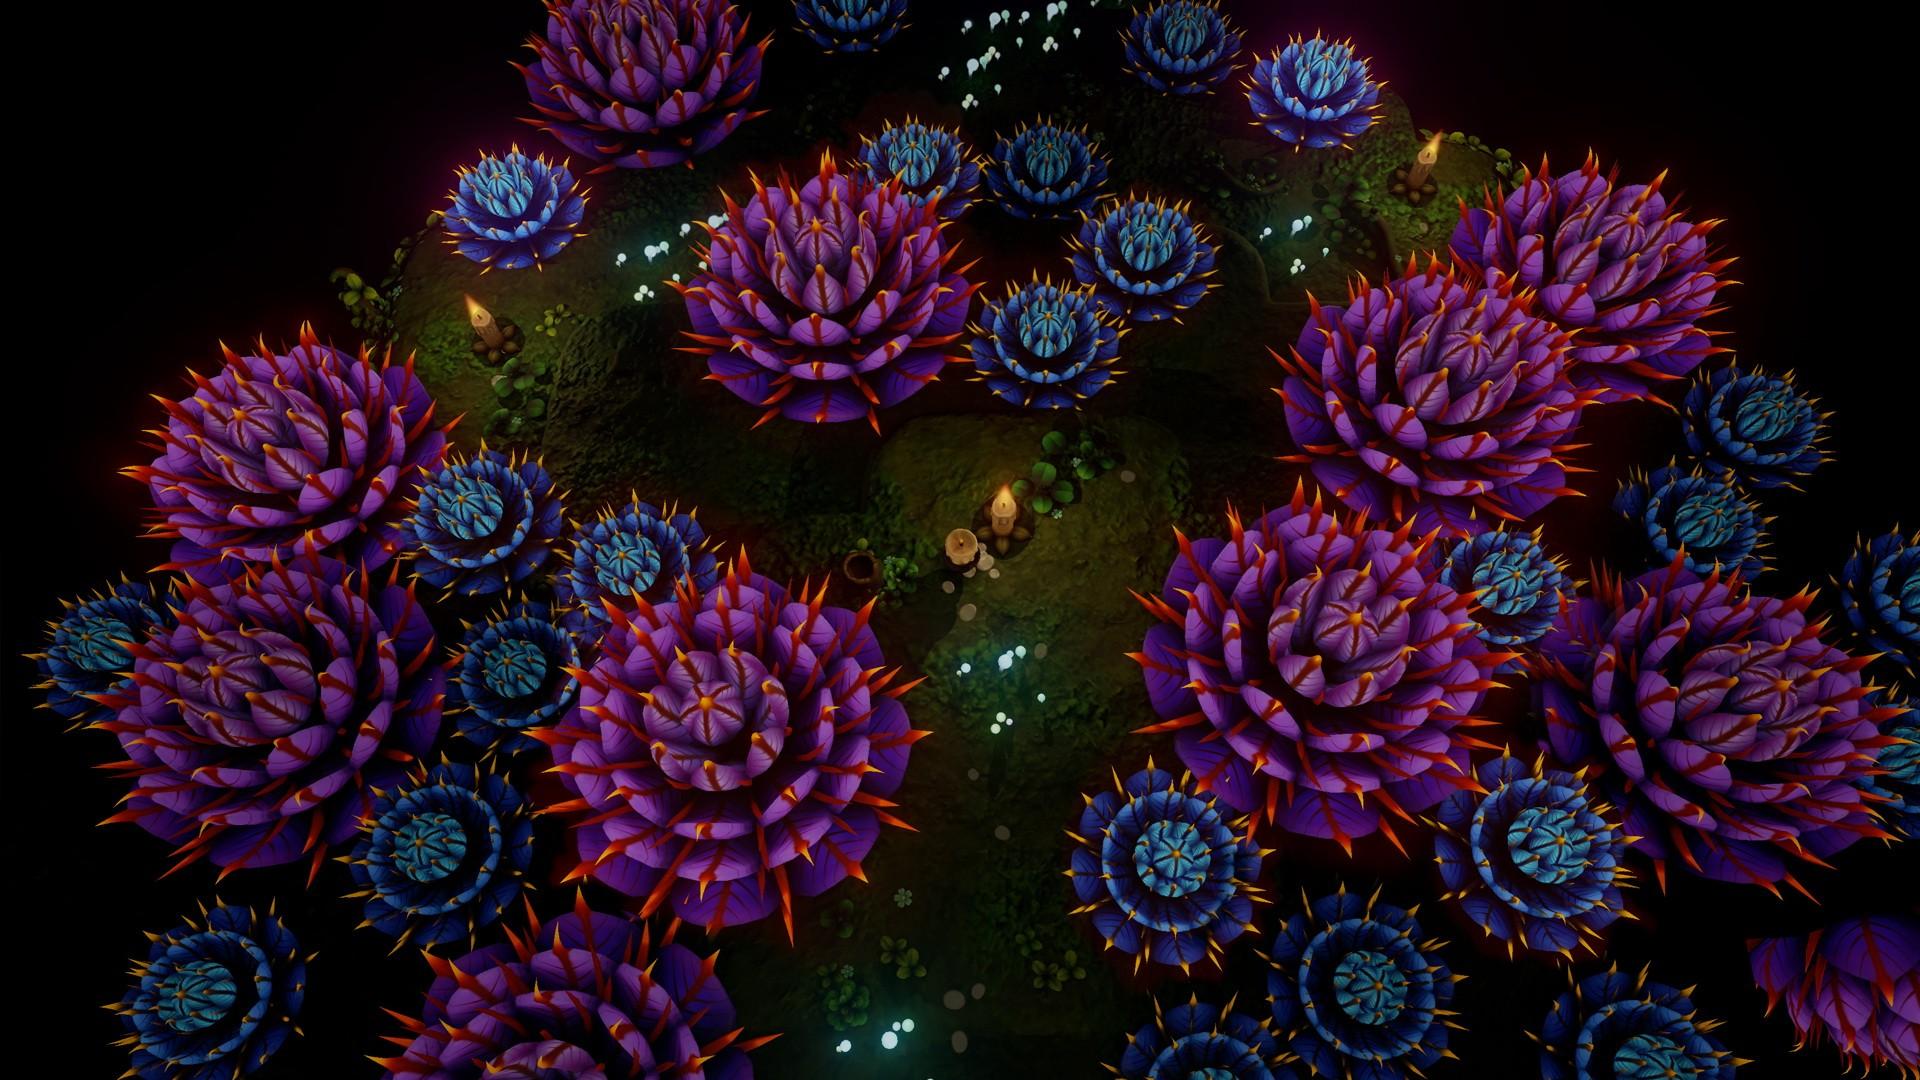 candle-man-screenshot-3.jpg